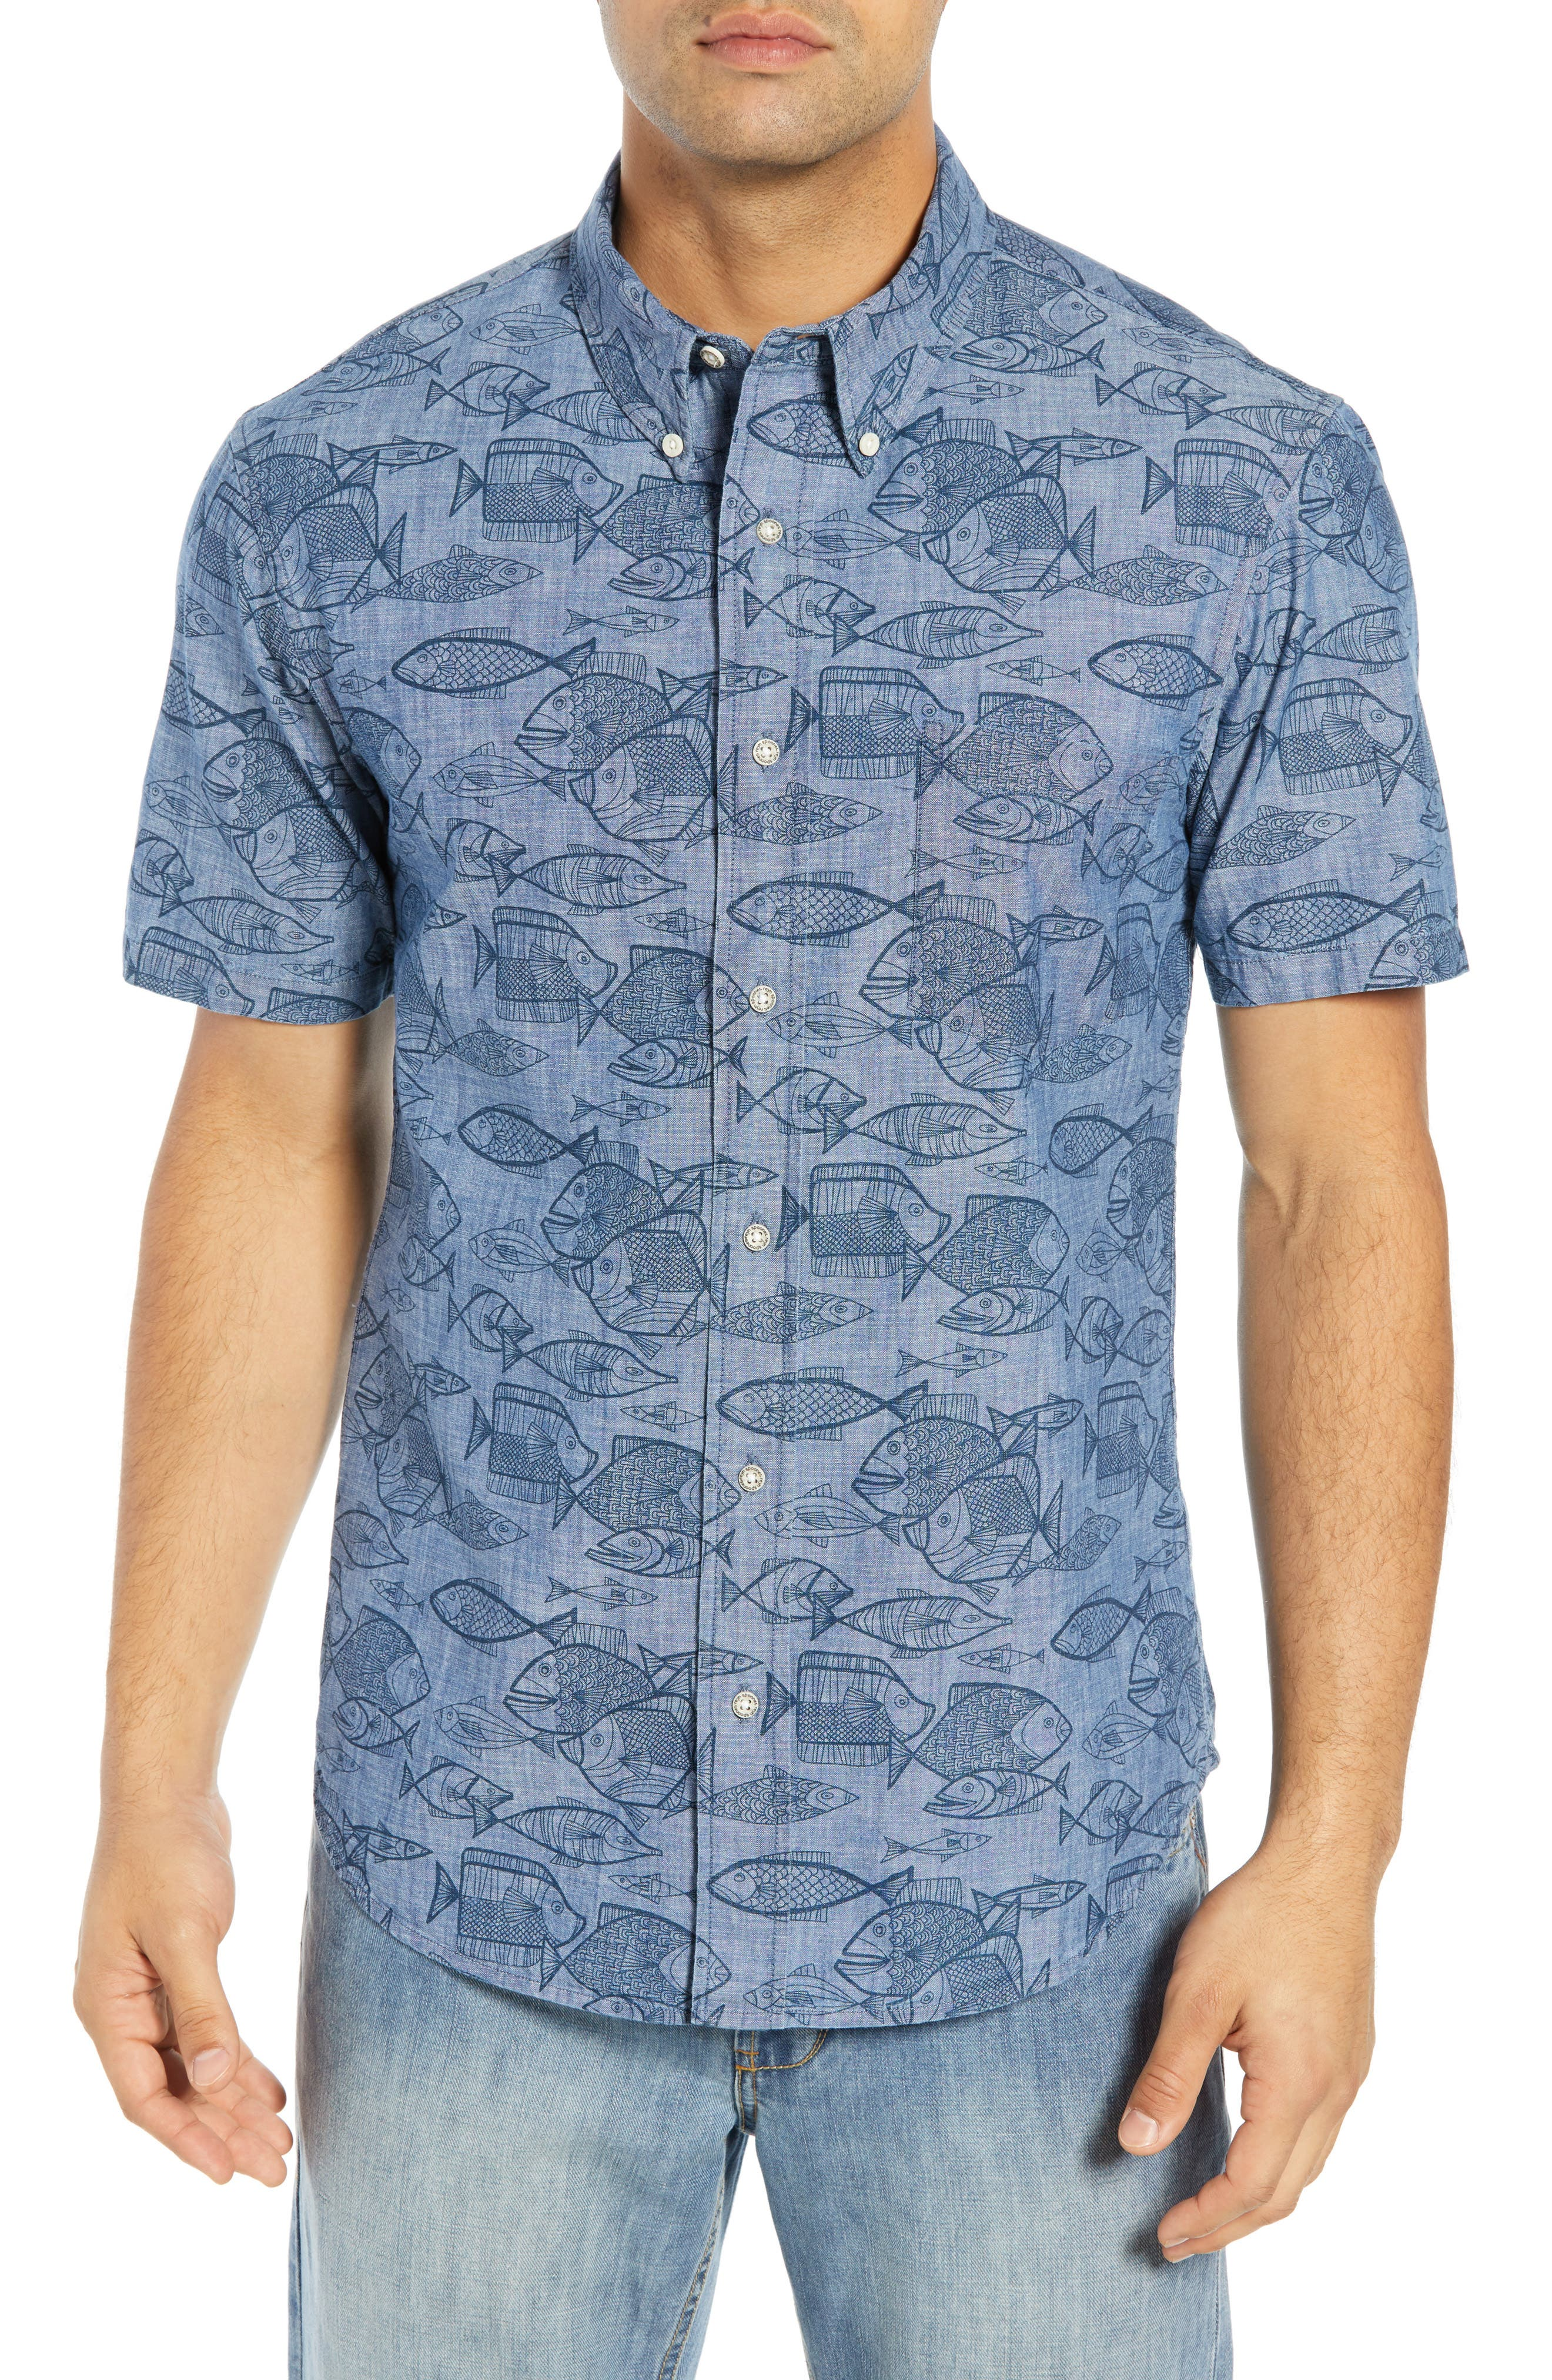 REYN SPOONER Kauhulu Tailored Fit Sport Shirt, Main, color, CHAMBRAY BLUE